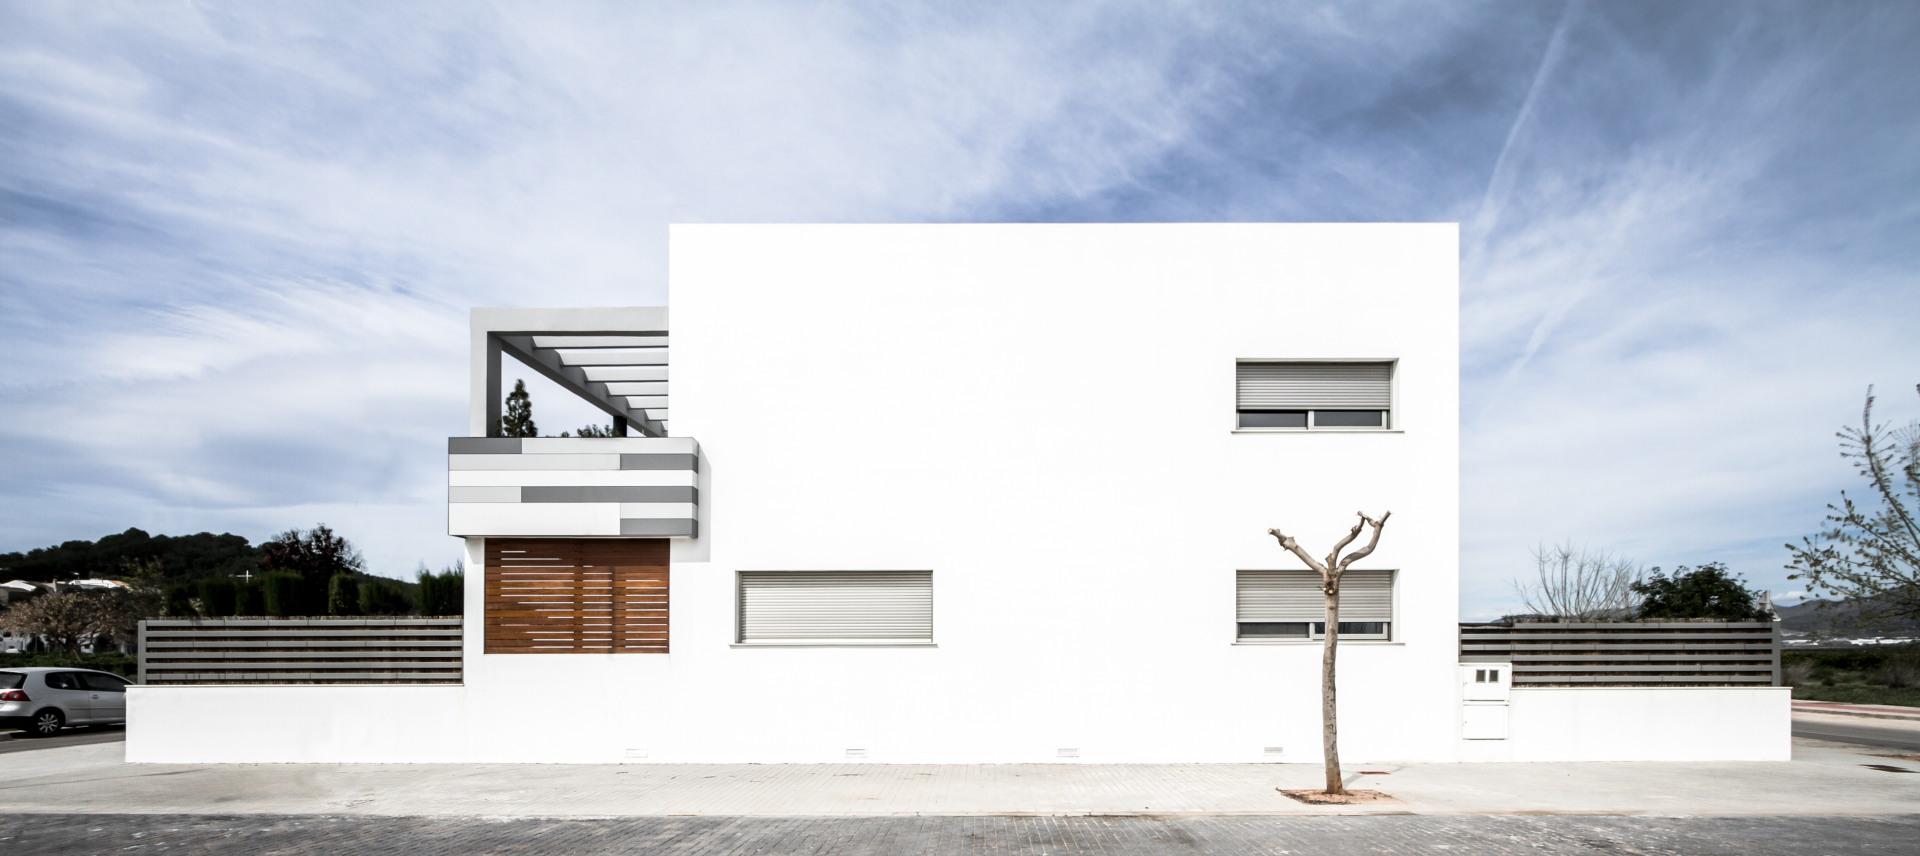 fotografia-arquitectura-valencia-german-cabo-viraje-v02 (3)